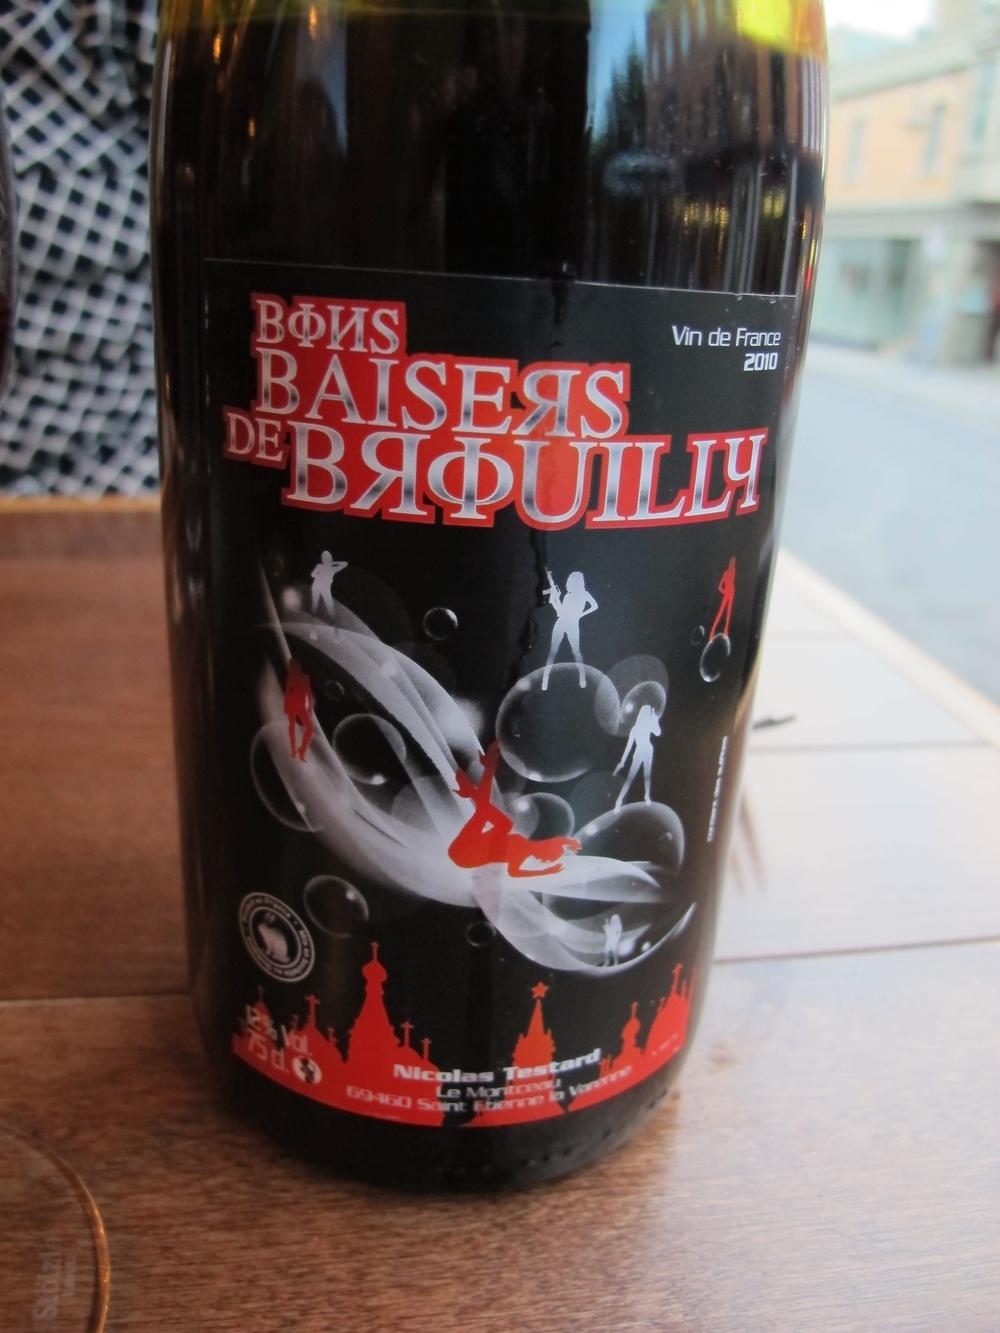 Nicolas Testard's Bons Baisers de Brouilly